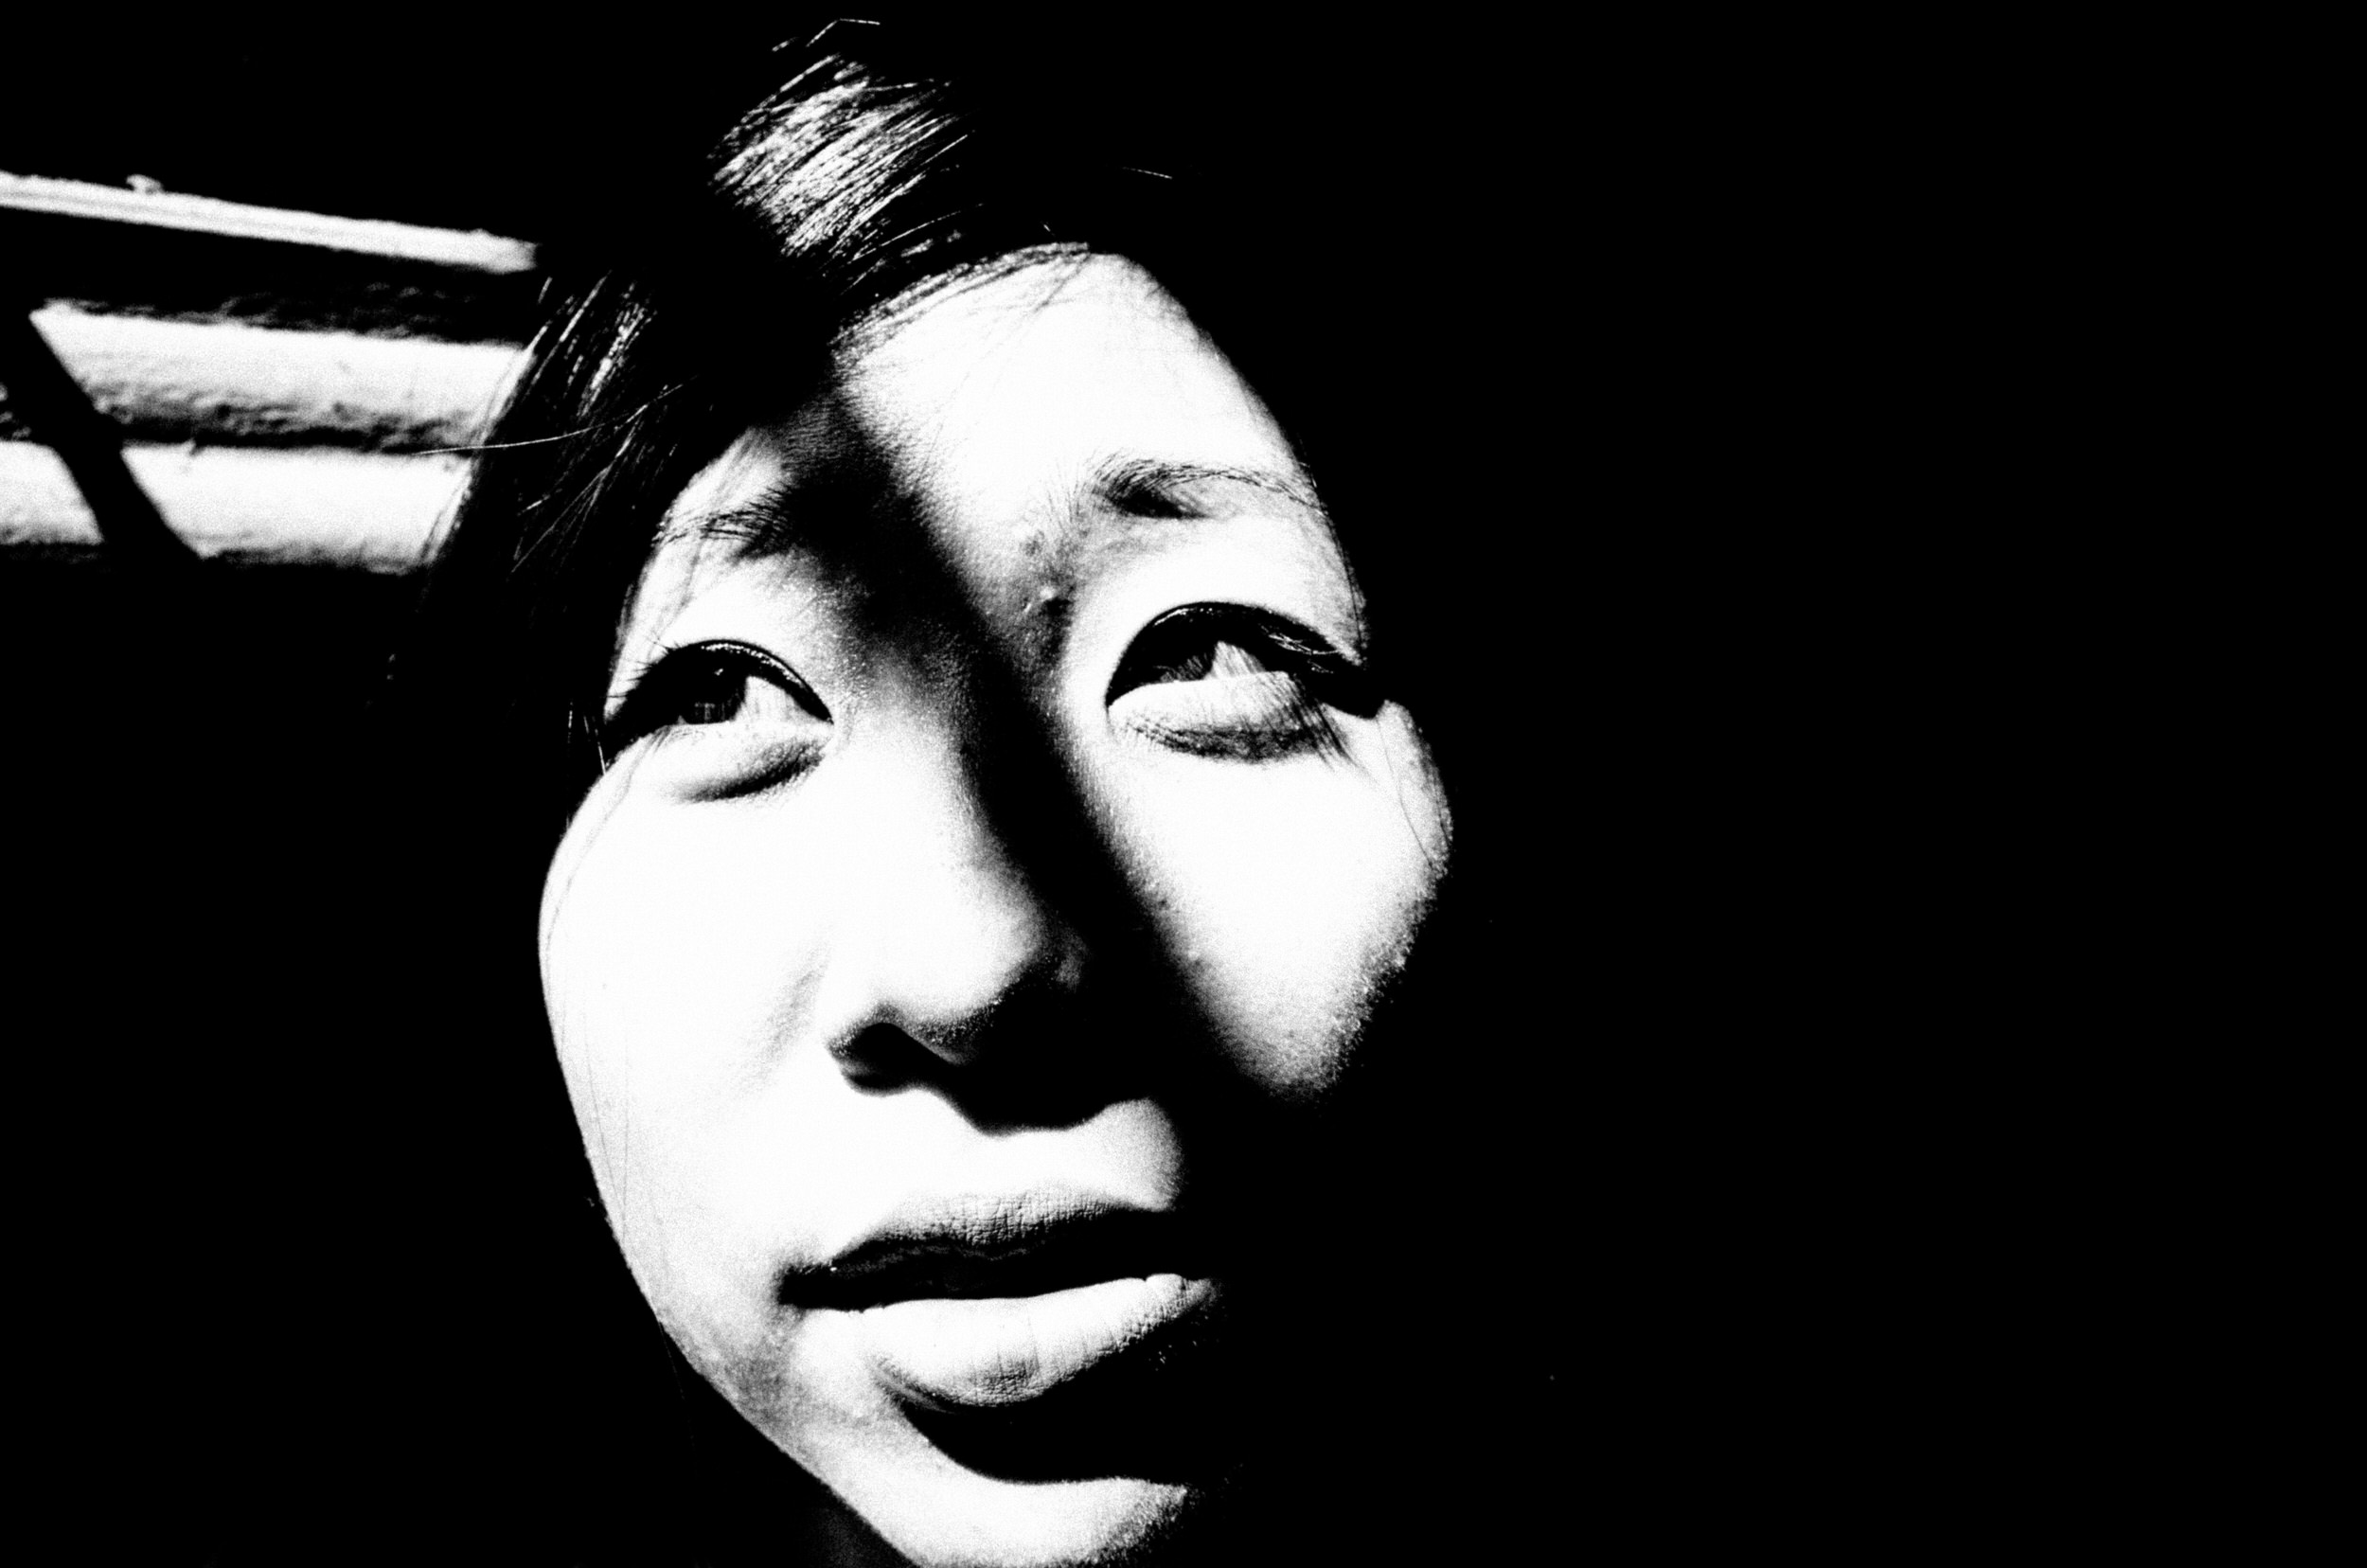 eric kim photography hanoi-0007800.jpg